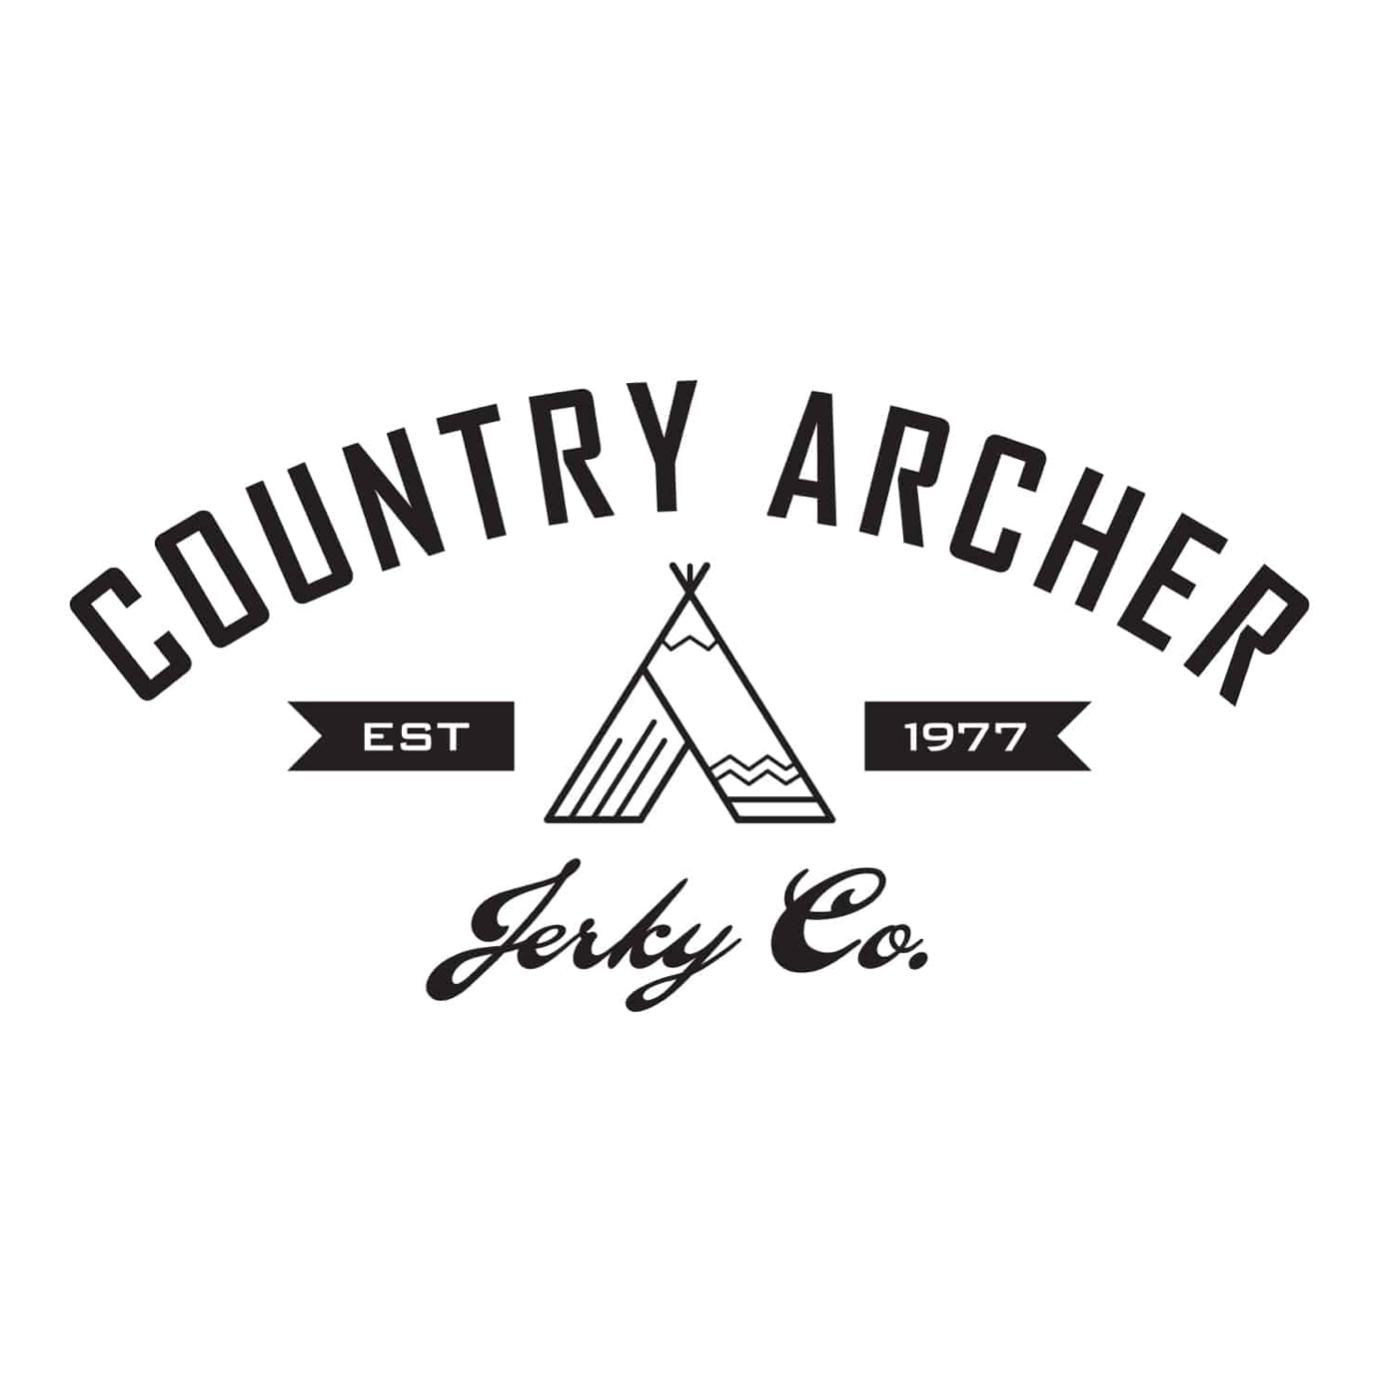 Country Archer Jerky logo - Certified Paleo, Keto Certified by the Paleo Foundation